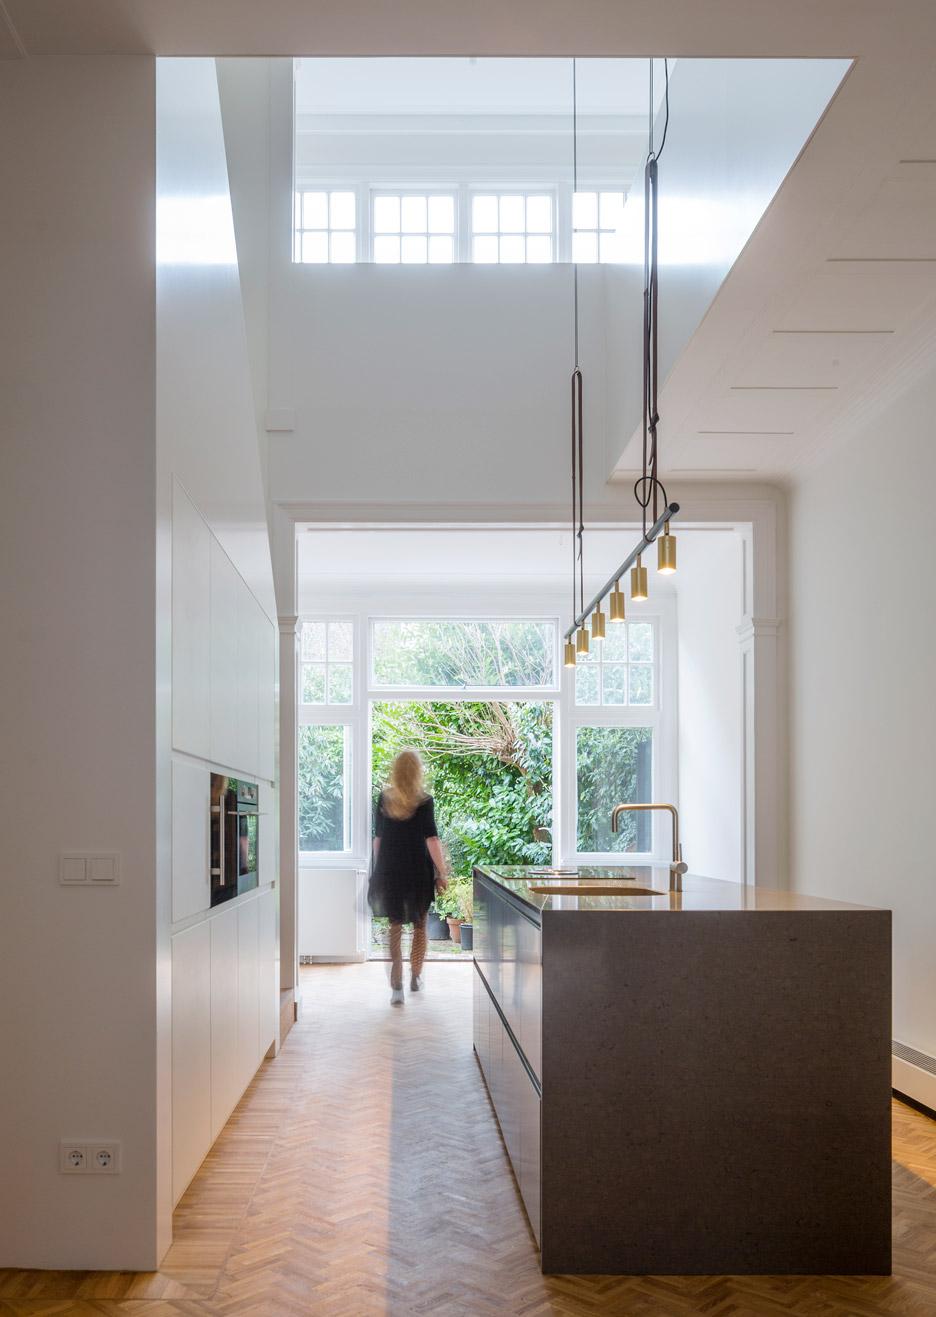 architecture_renovation_project_hague-interior_house__design_studia_interiors_osnovadesign_osnova_poltava_06